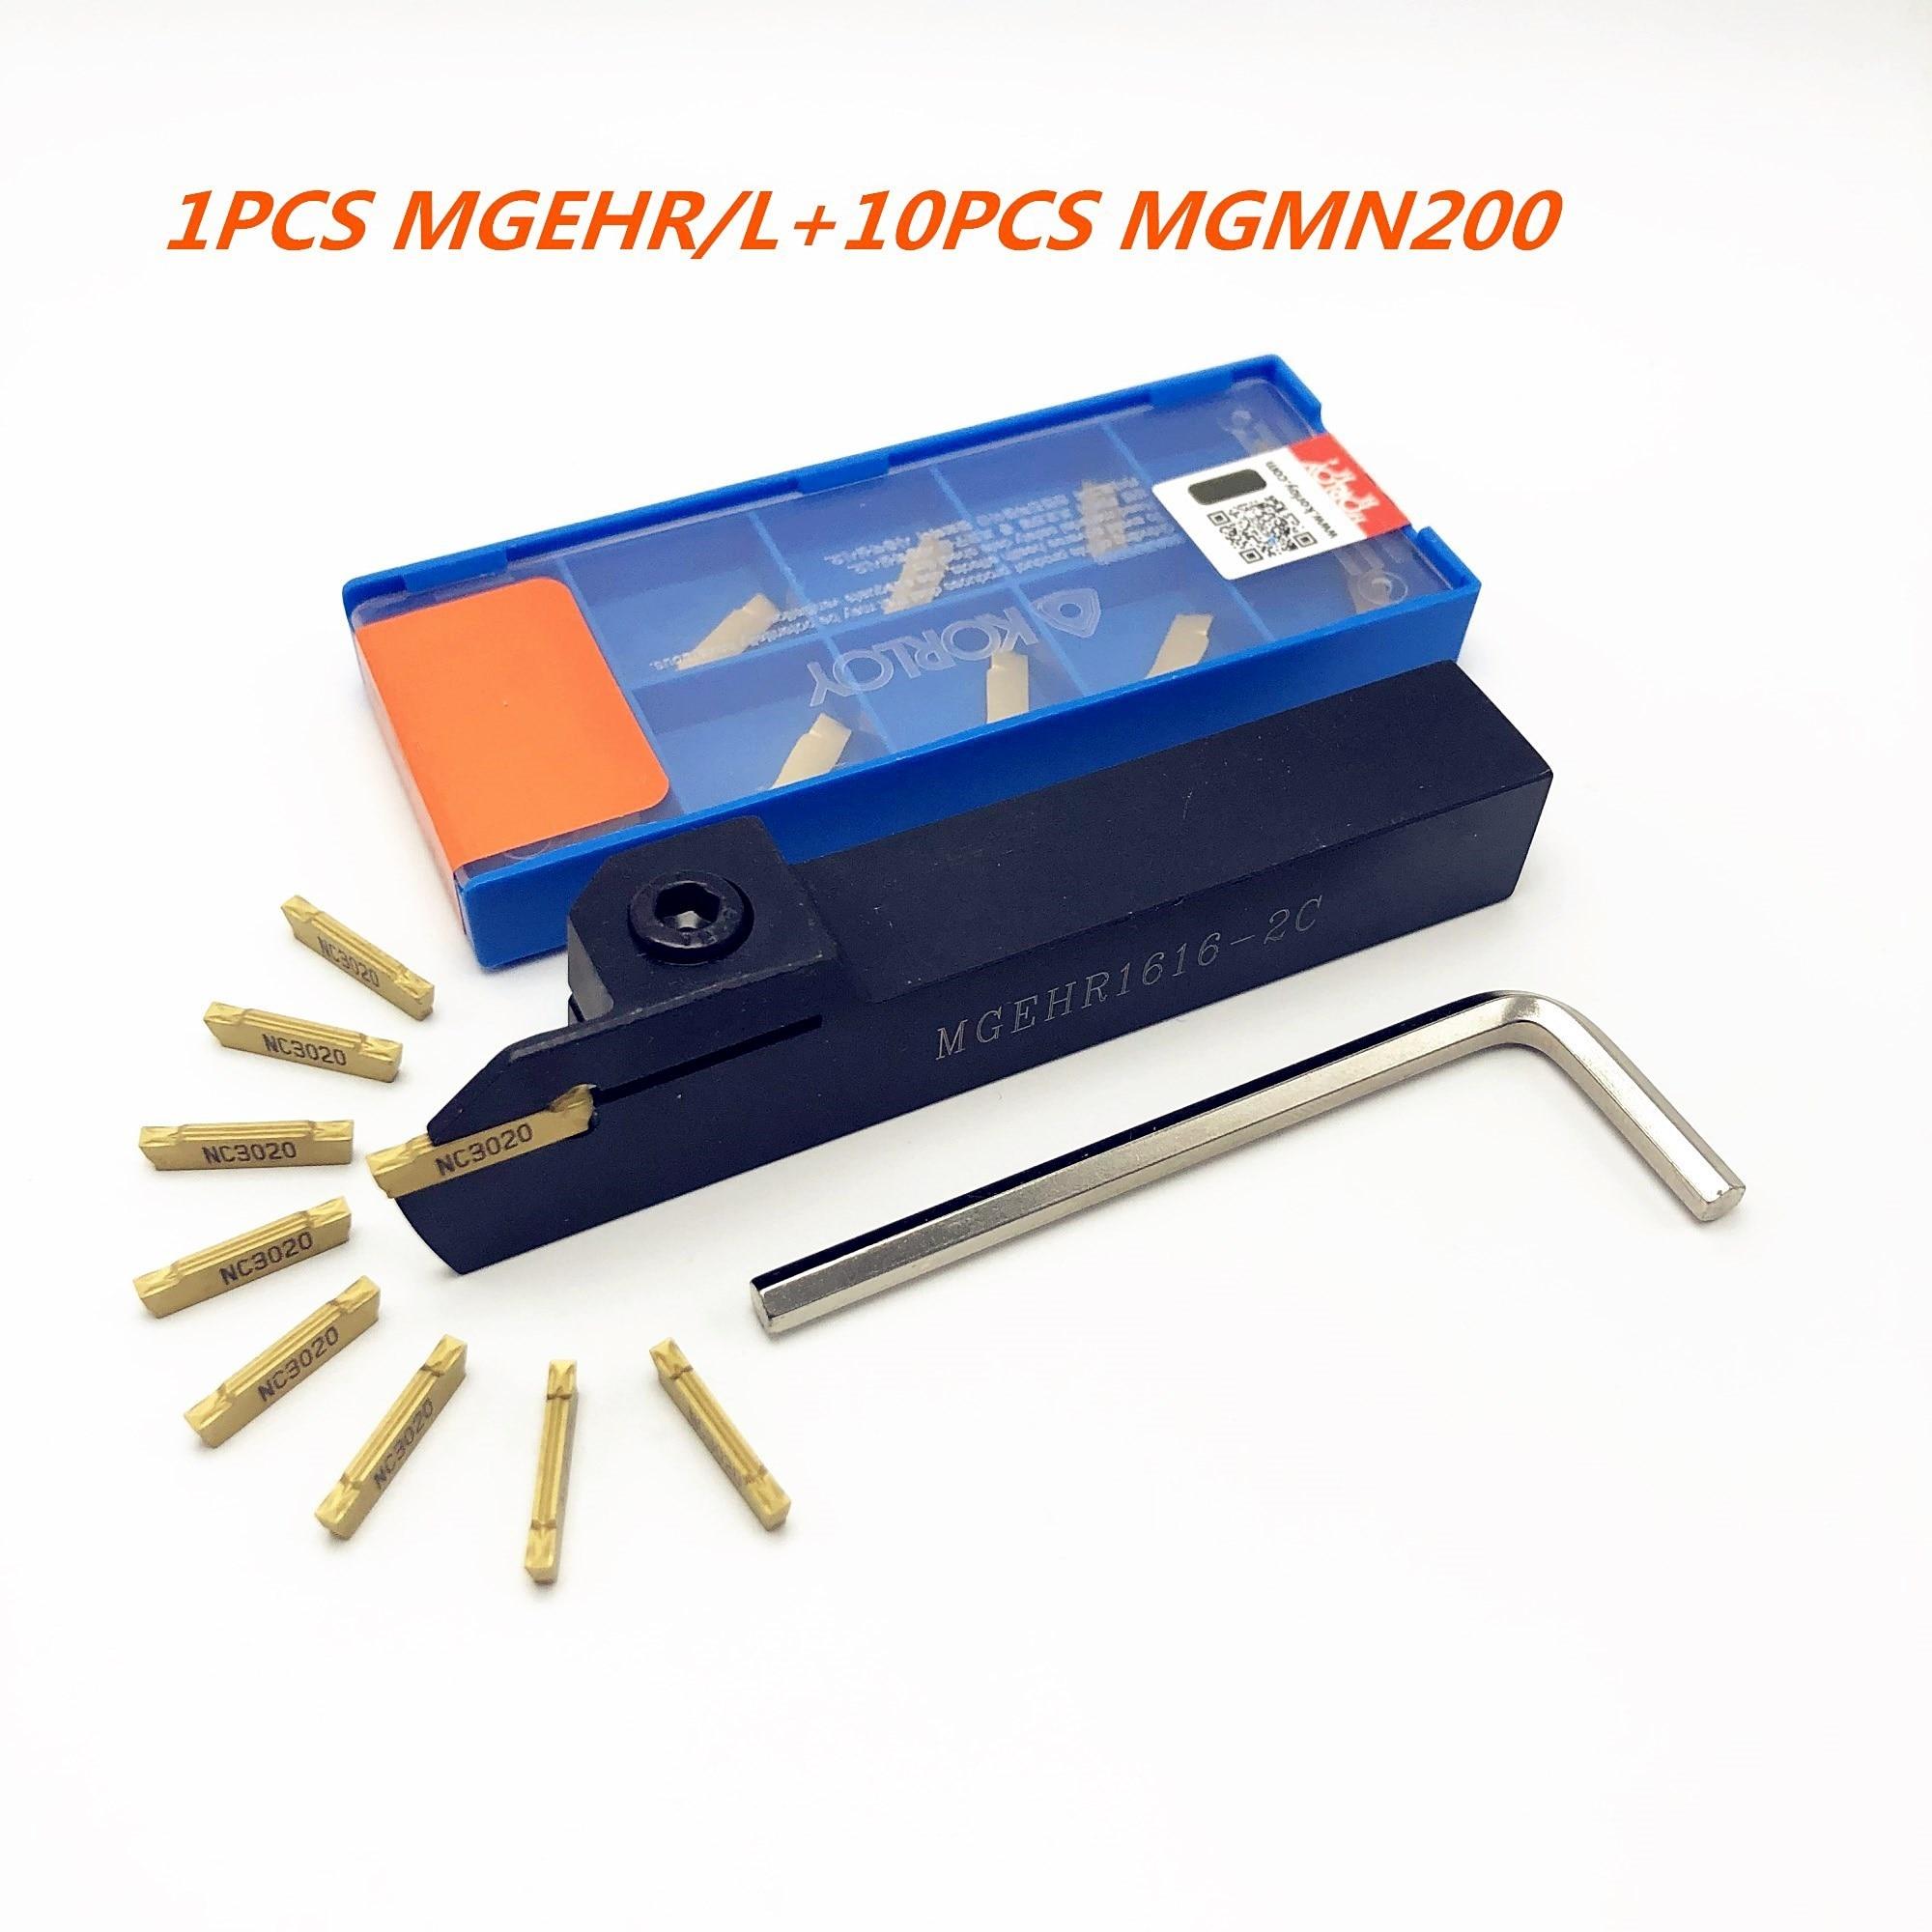 1PCS CNC slot cutter MGEHR/L 1010 1212 1616 2020 2525-2.0 outer diameter knife holder +10PCS korloy MGMN200-2mm slot blade